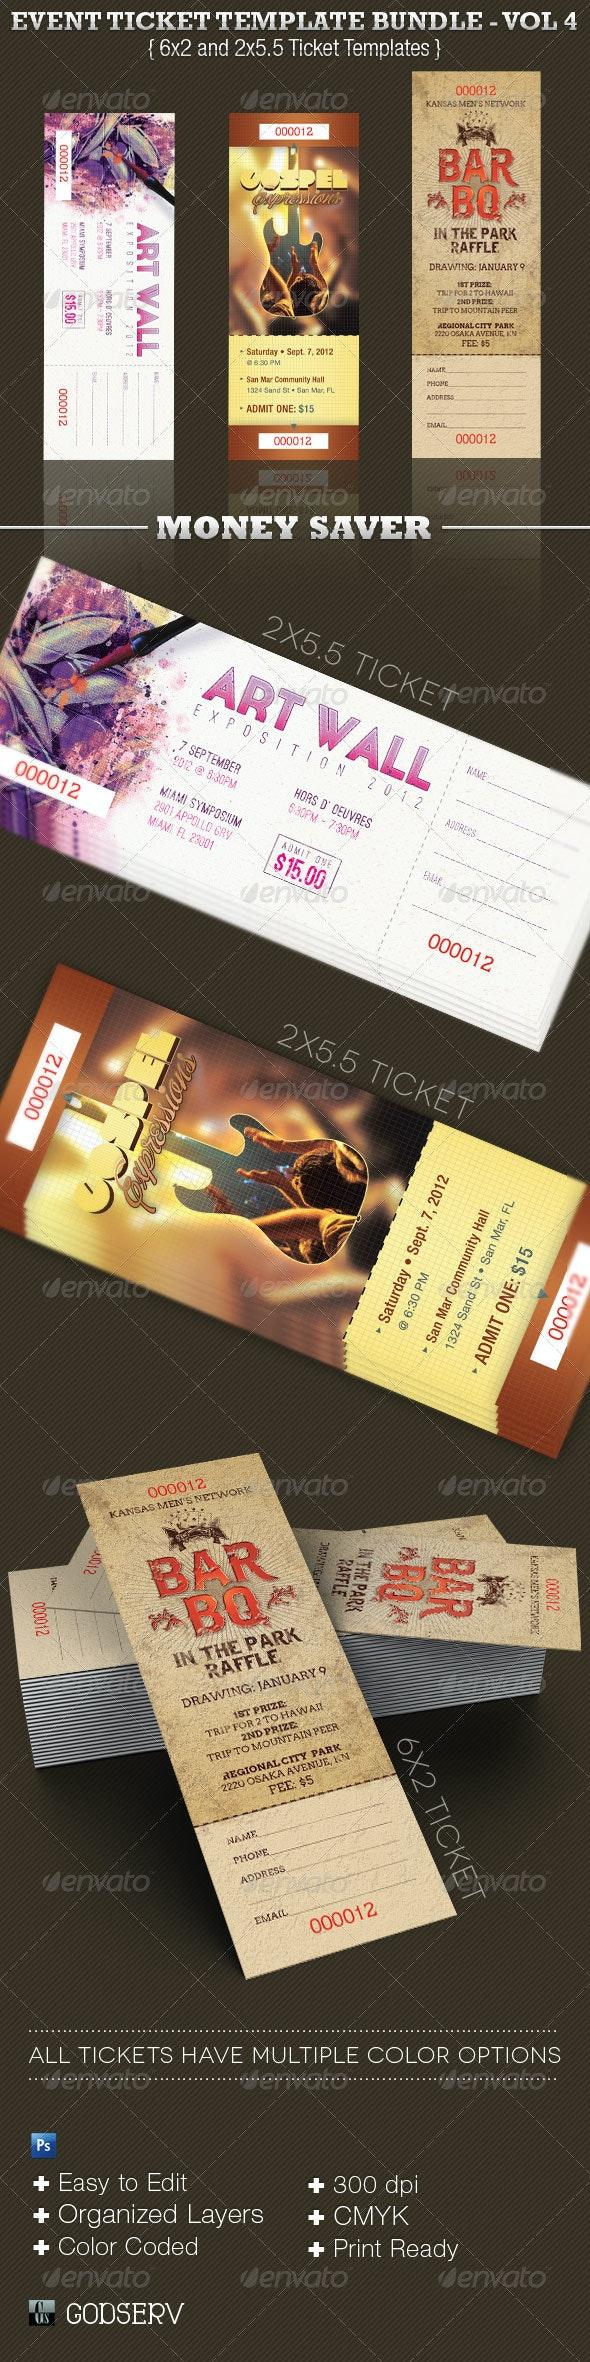 Event Ticket Template Bundle Volume 4 - Miscellaneous Print Templates